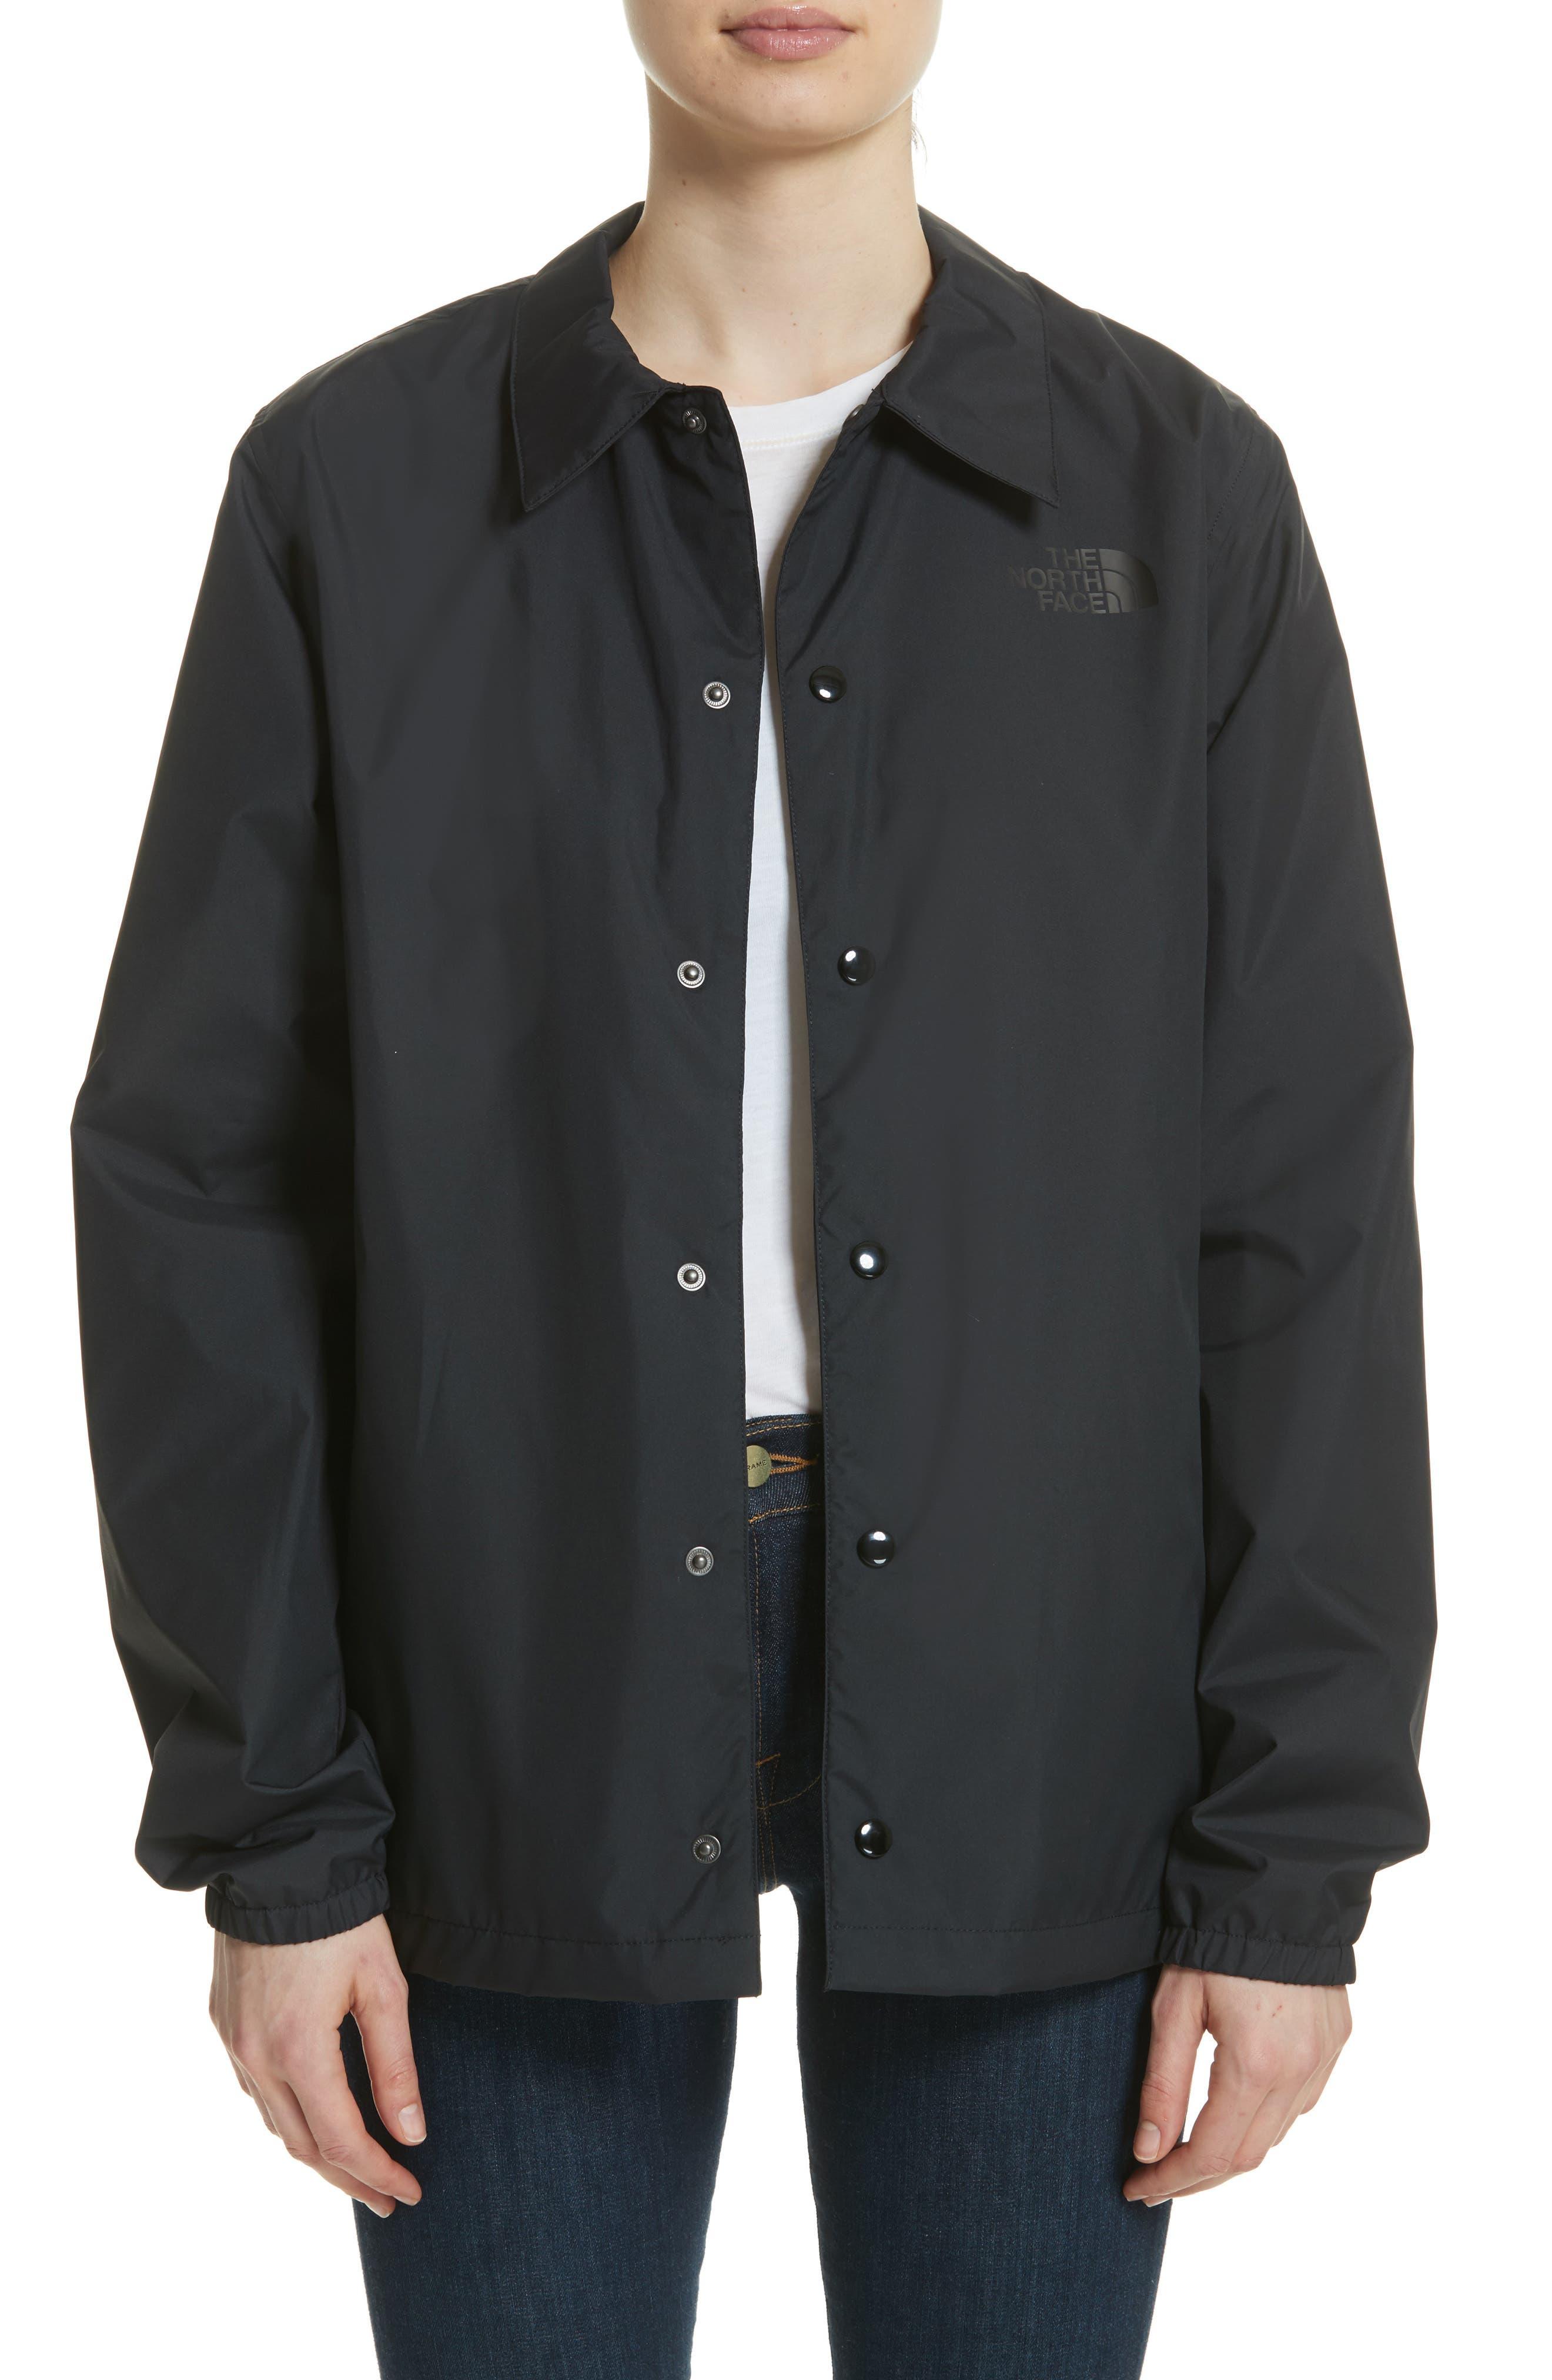 Coaches Jacket,                             Main thumbnail 1, color,                             001